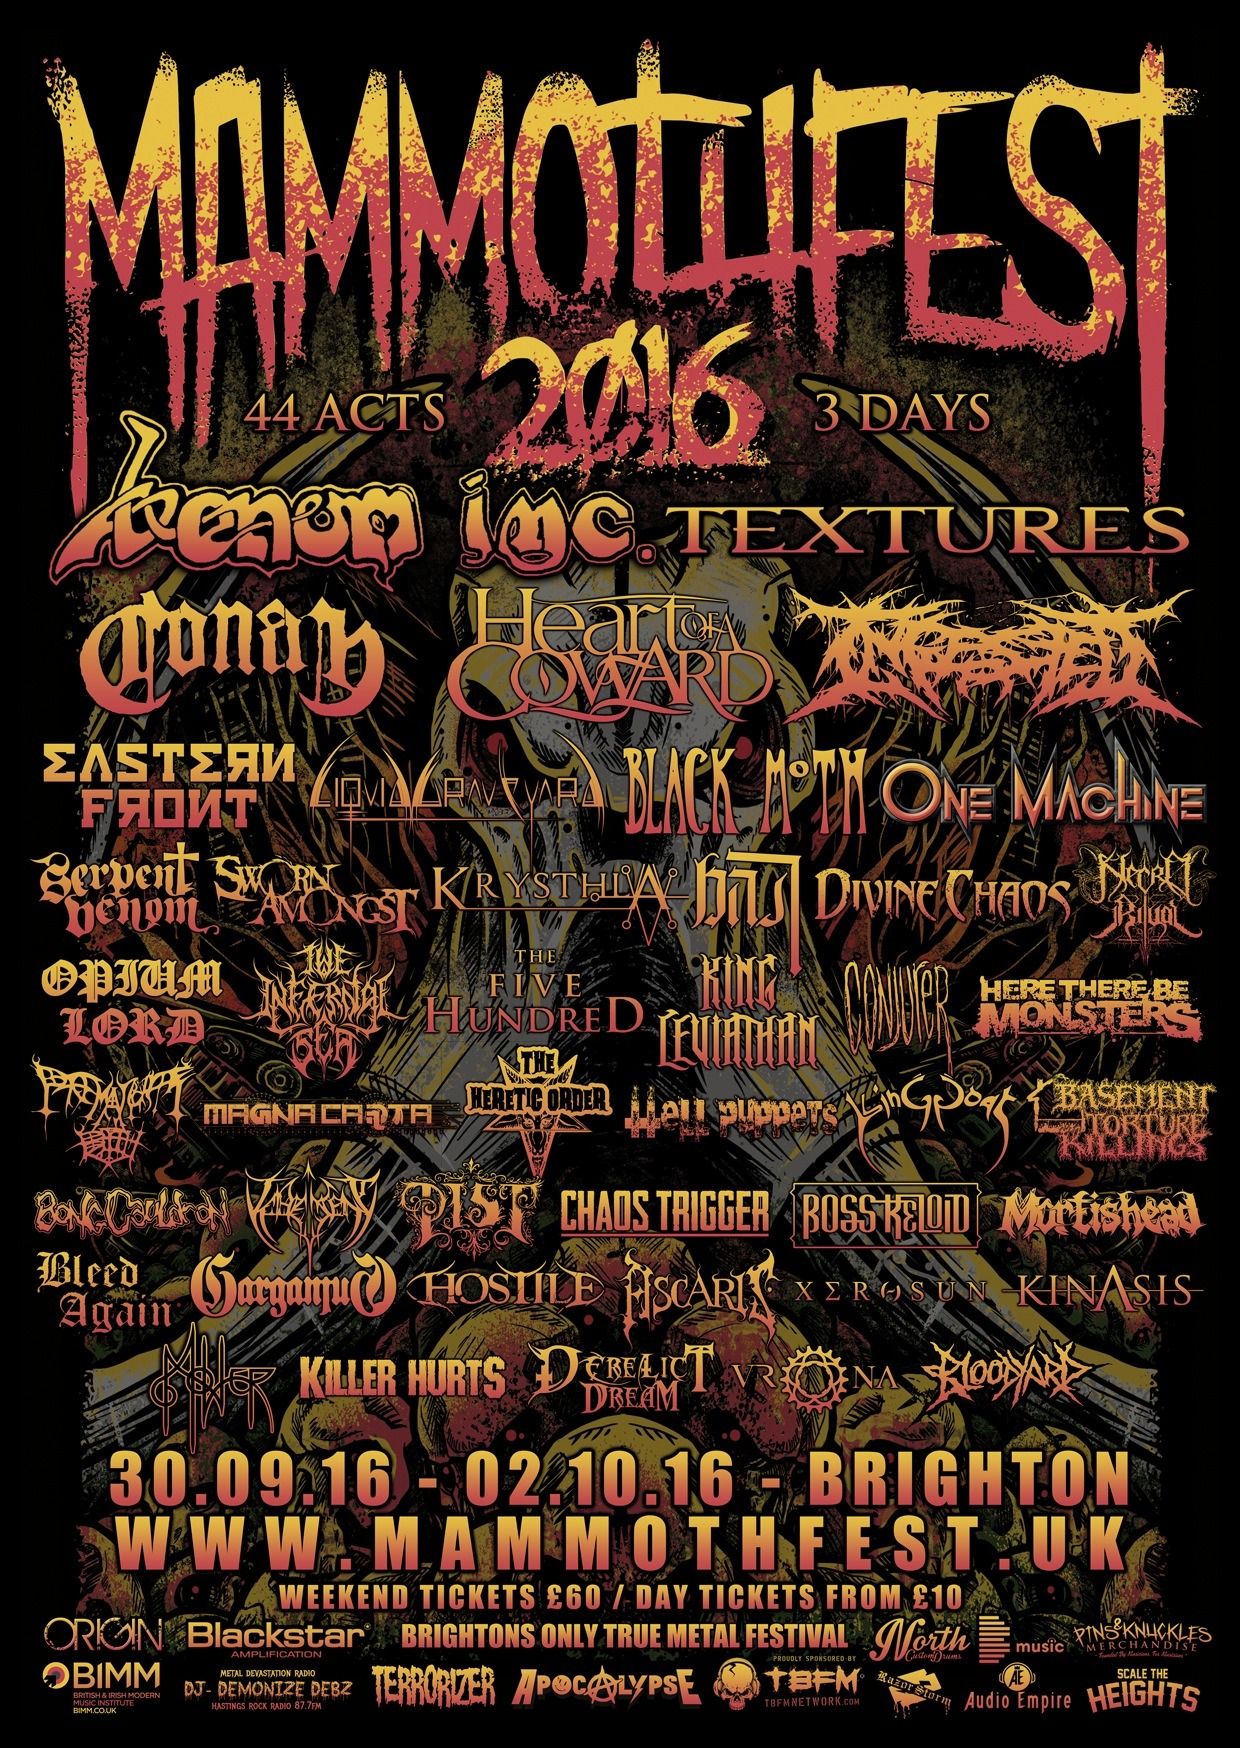 Mammothfest 2016